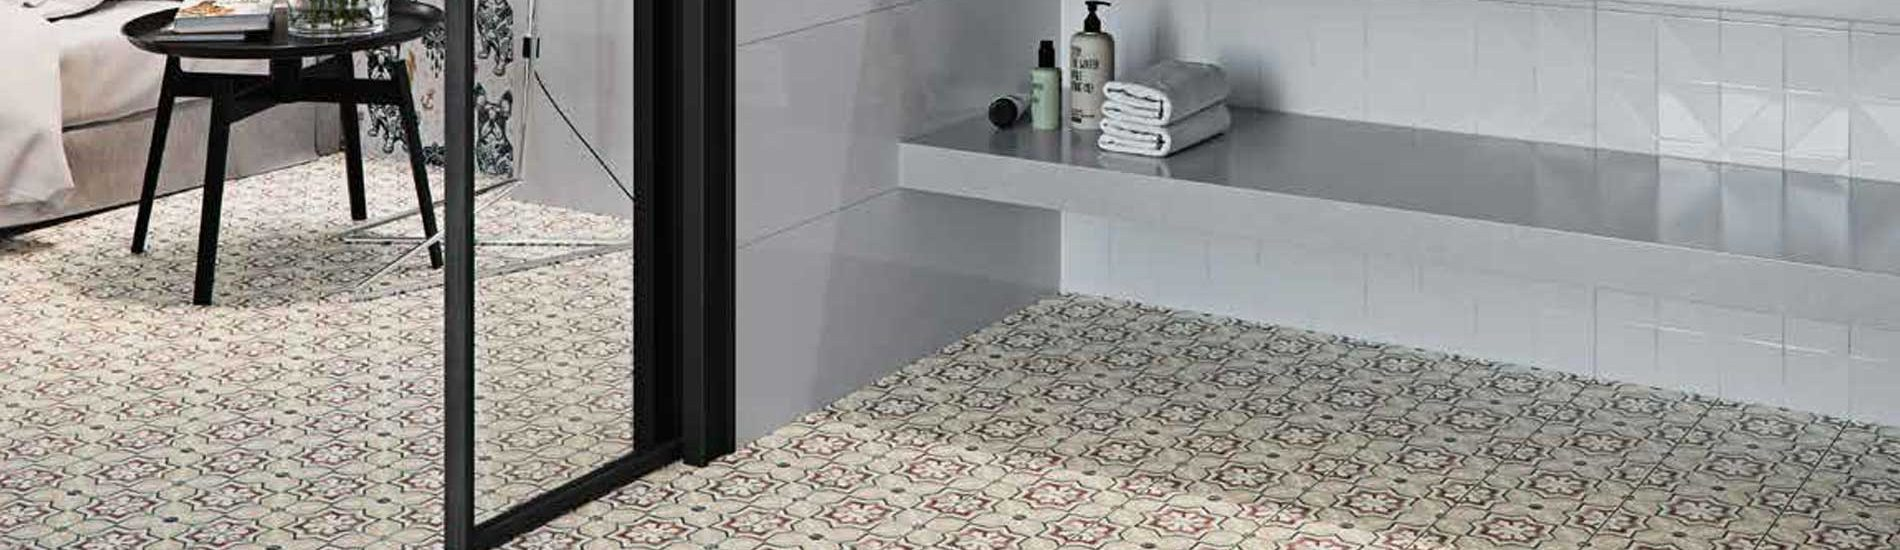 banner-sao-luis-cement-deco-pattern-look-tile-spanish-aparici-apavisa